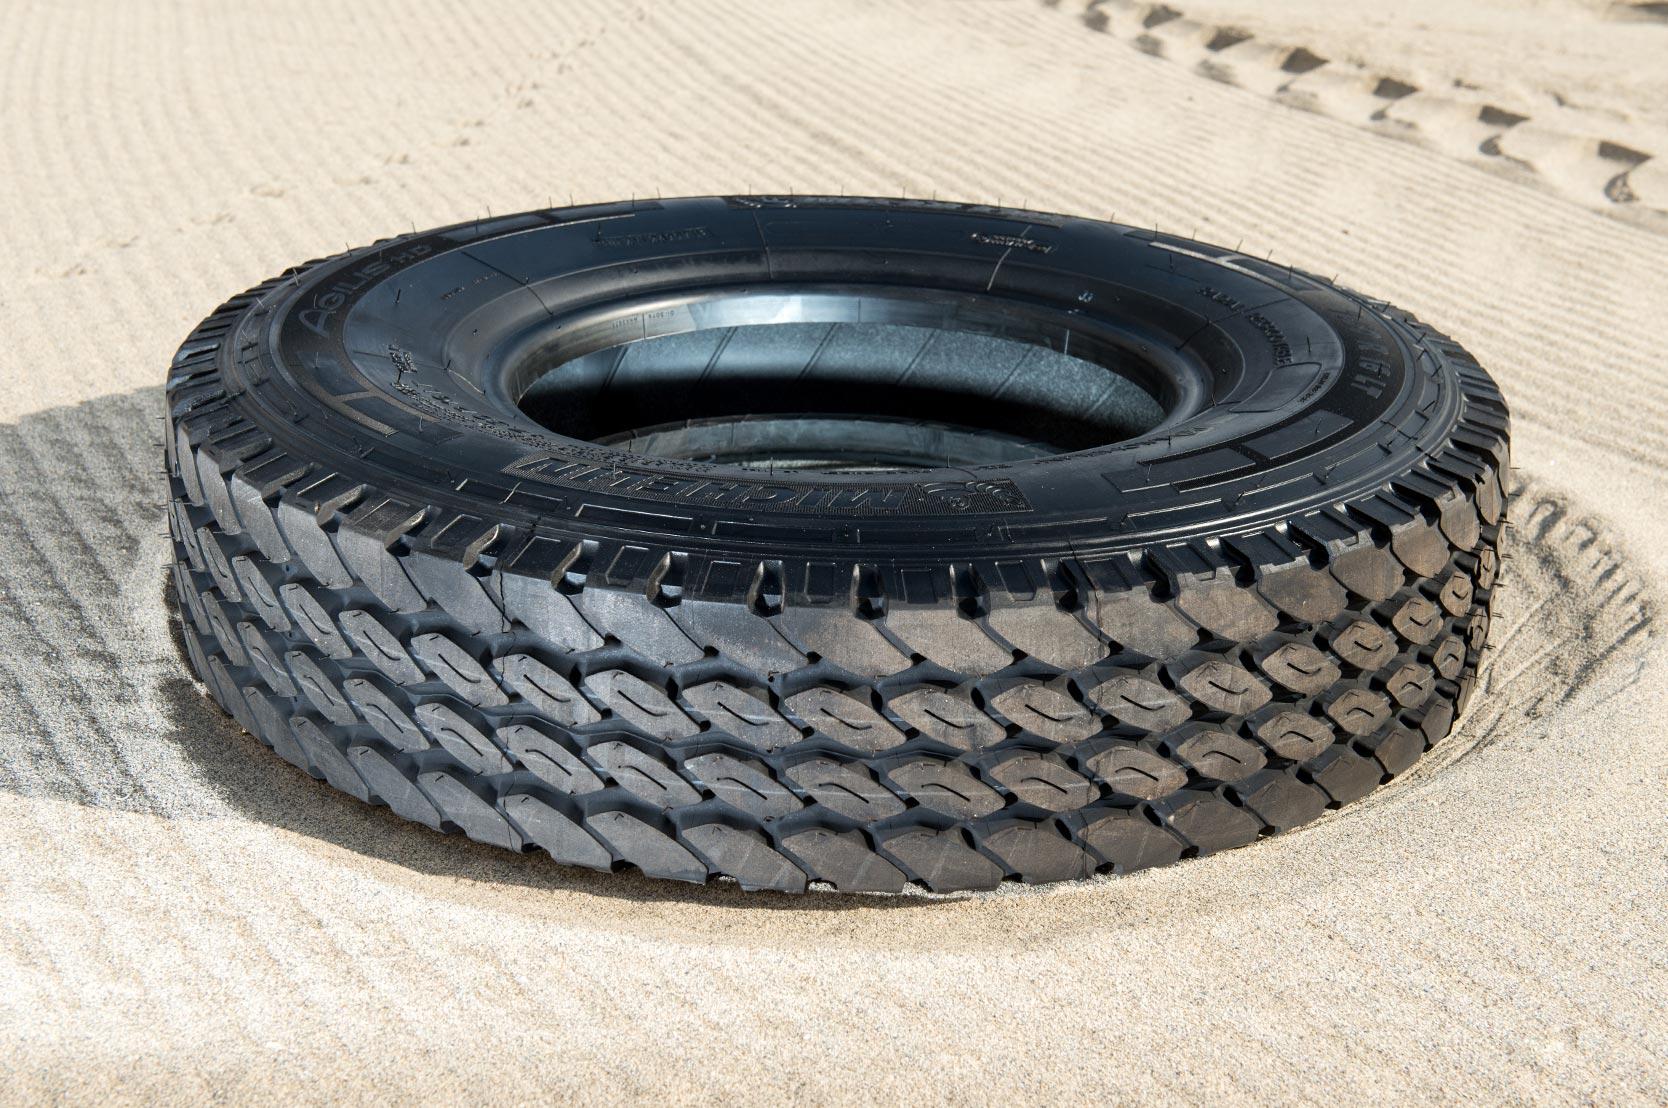 Tyres (11)